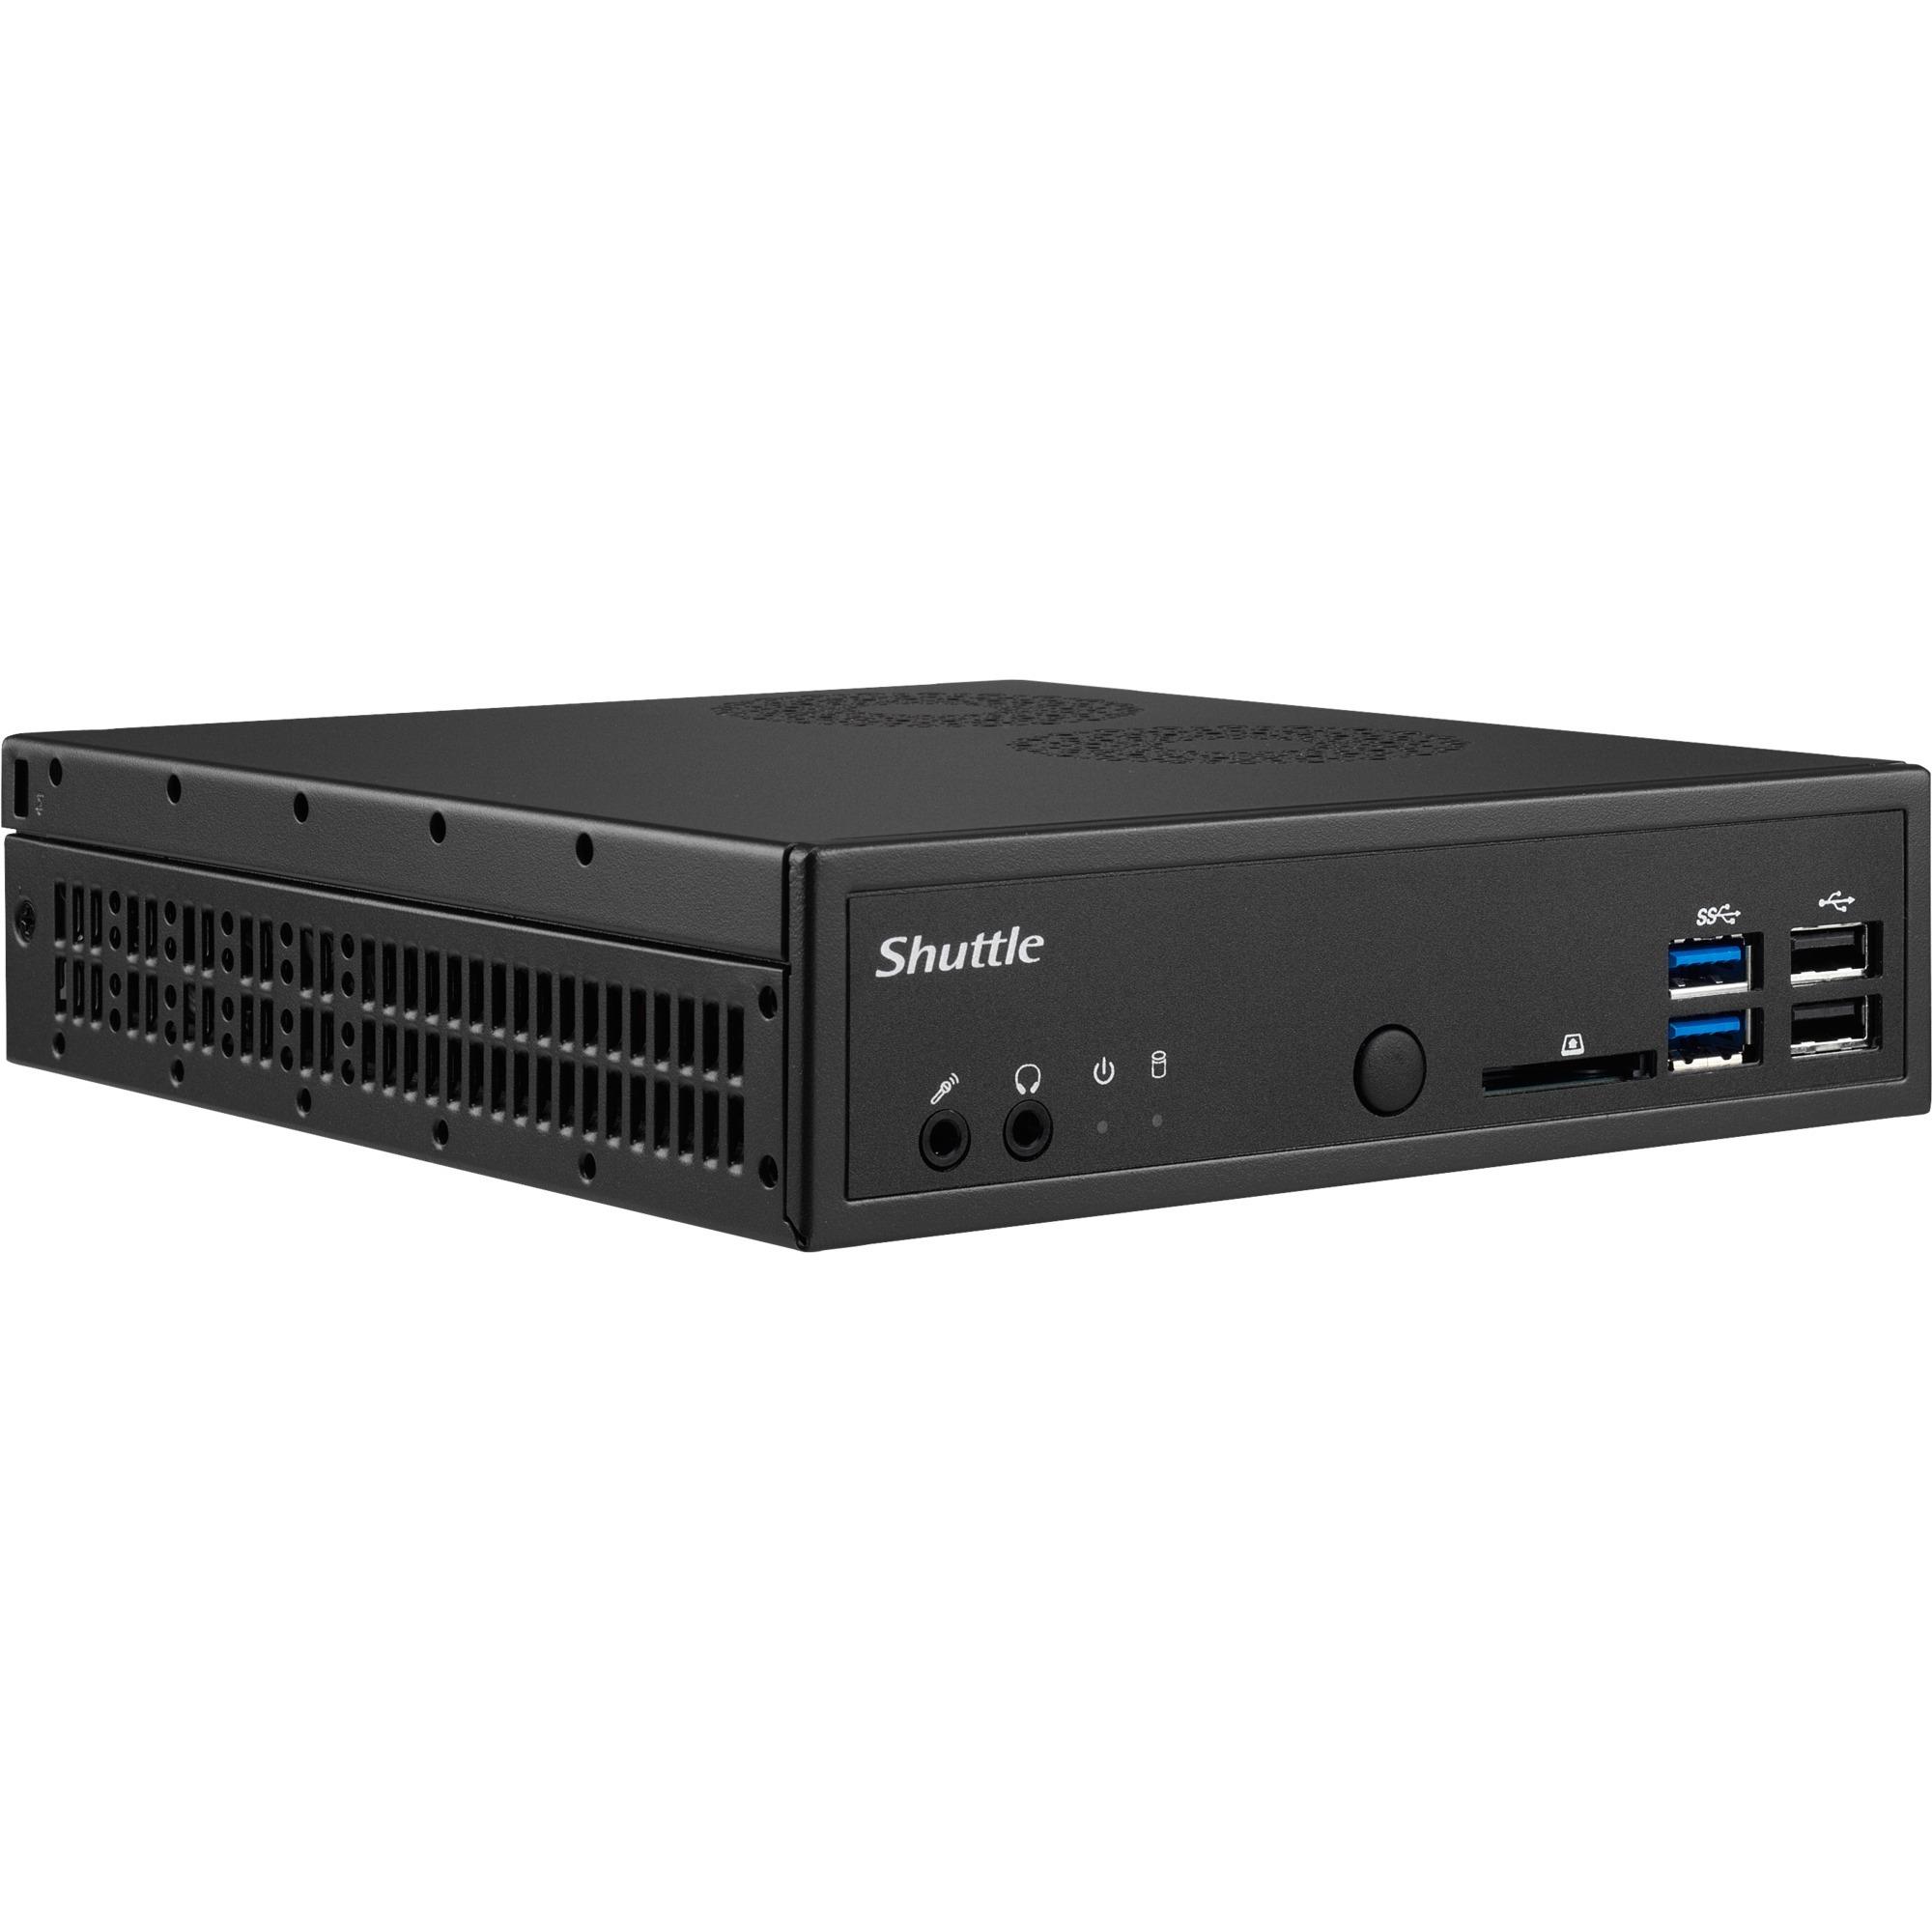 DQ170 PC/estación de trabajo barebone Intel Q170 LGA 1151 (Zócalo H4) Nettop Negro